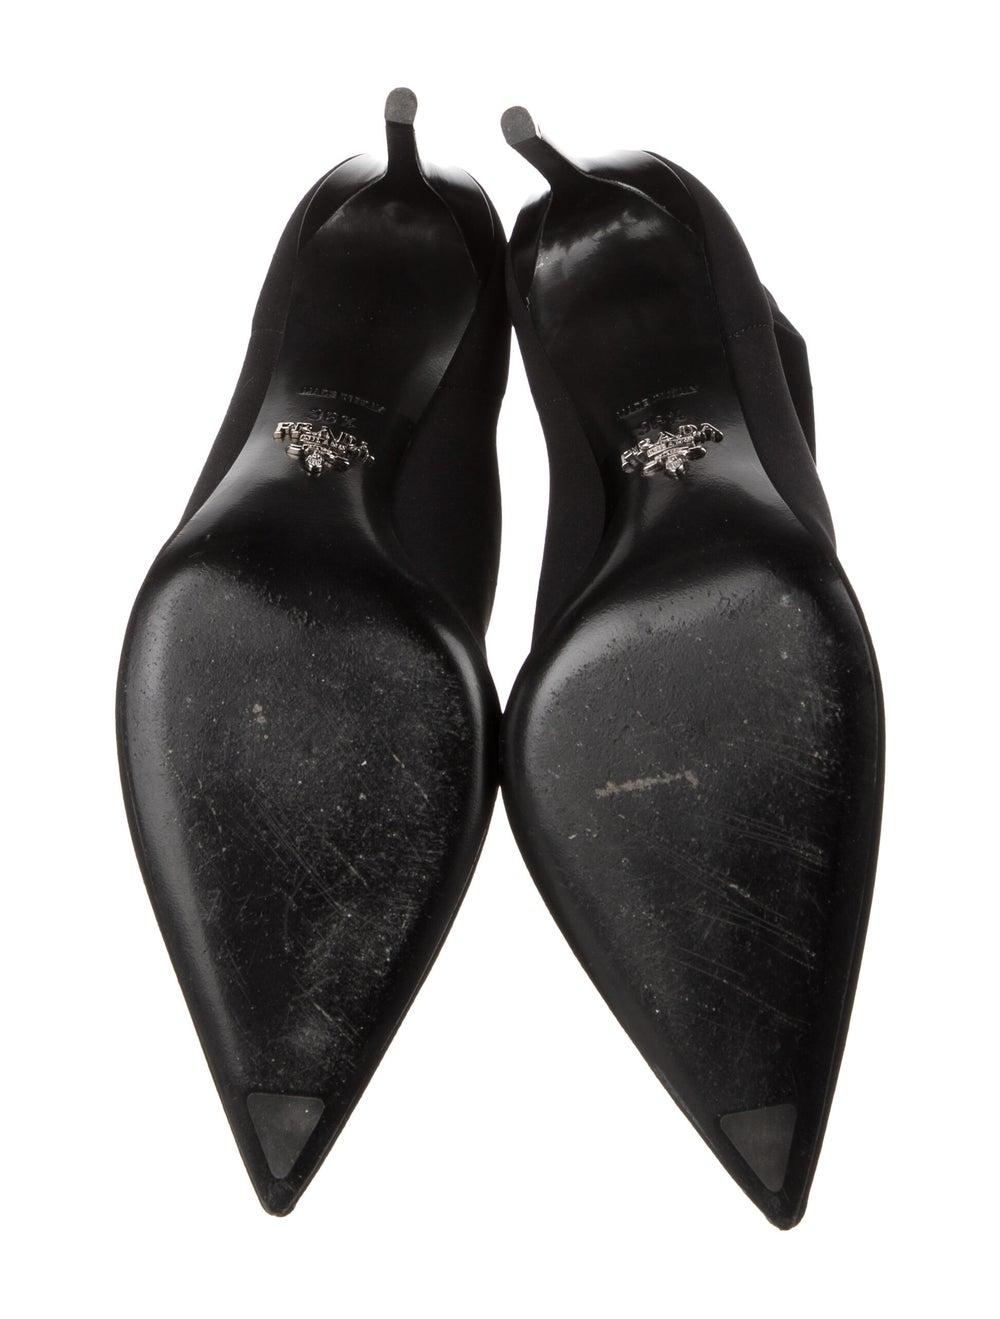 Prada Sock Boots Black - image 5